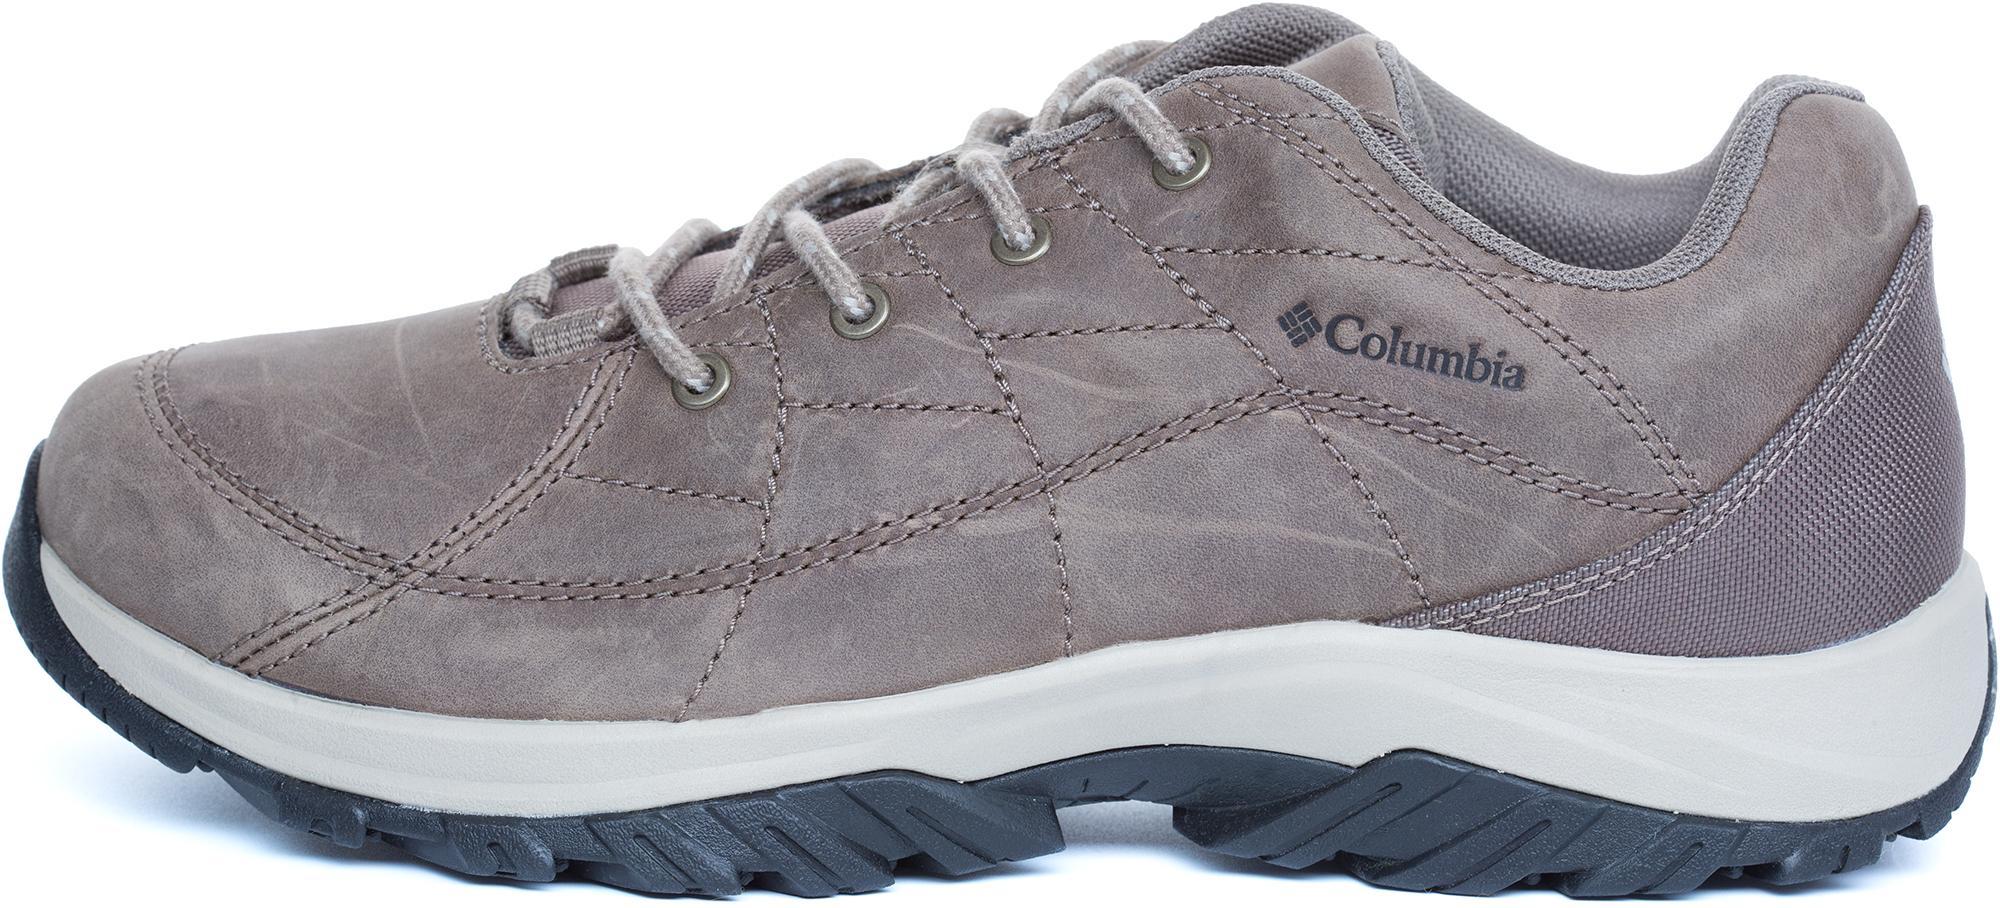 Columbia Полуботинки мужские Columbia Crestwood Venture, размер 45